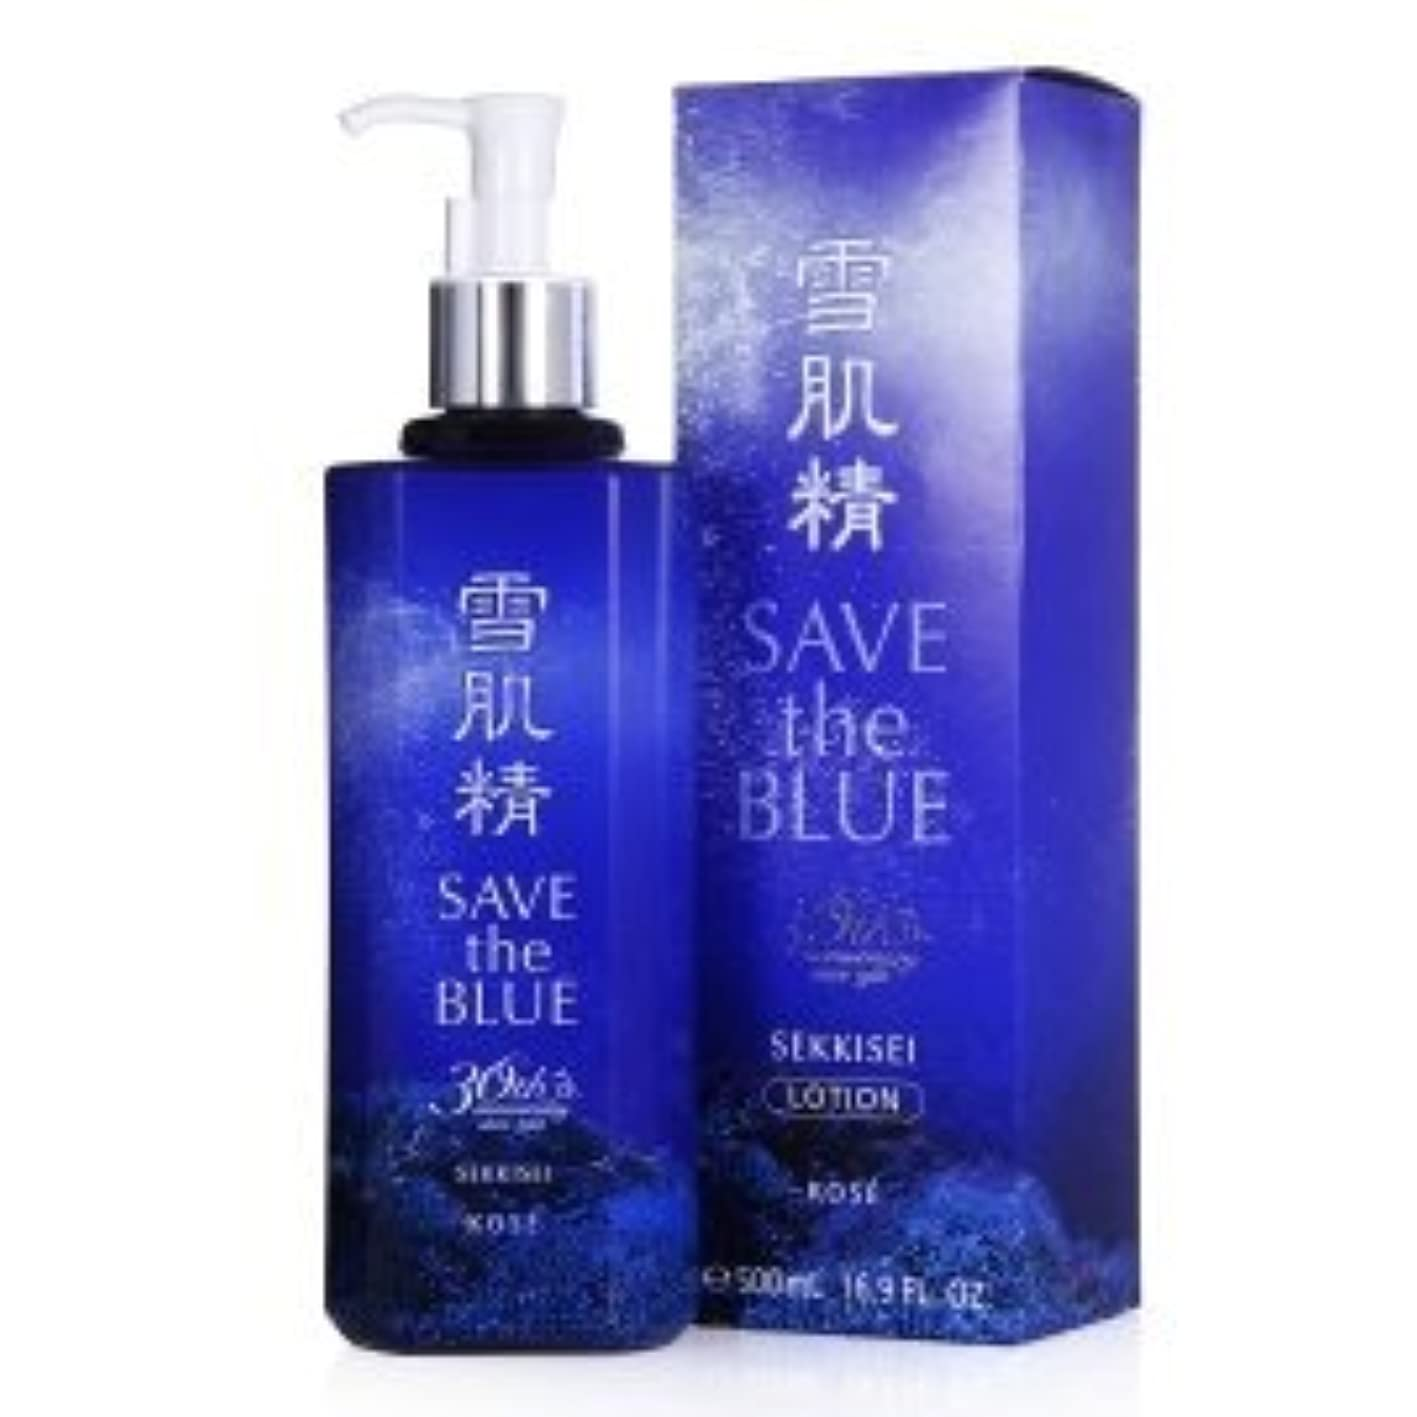 KOSE コーセー 薬用 雪肌精 化粧水 500ml 【SAVE the BLUE】